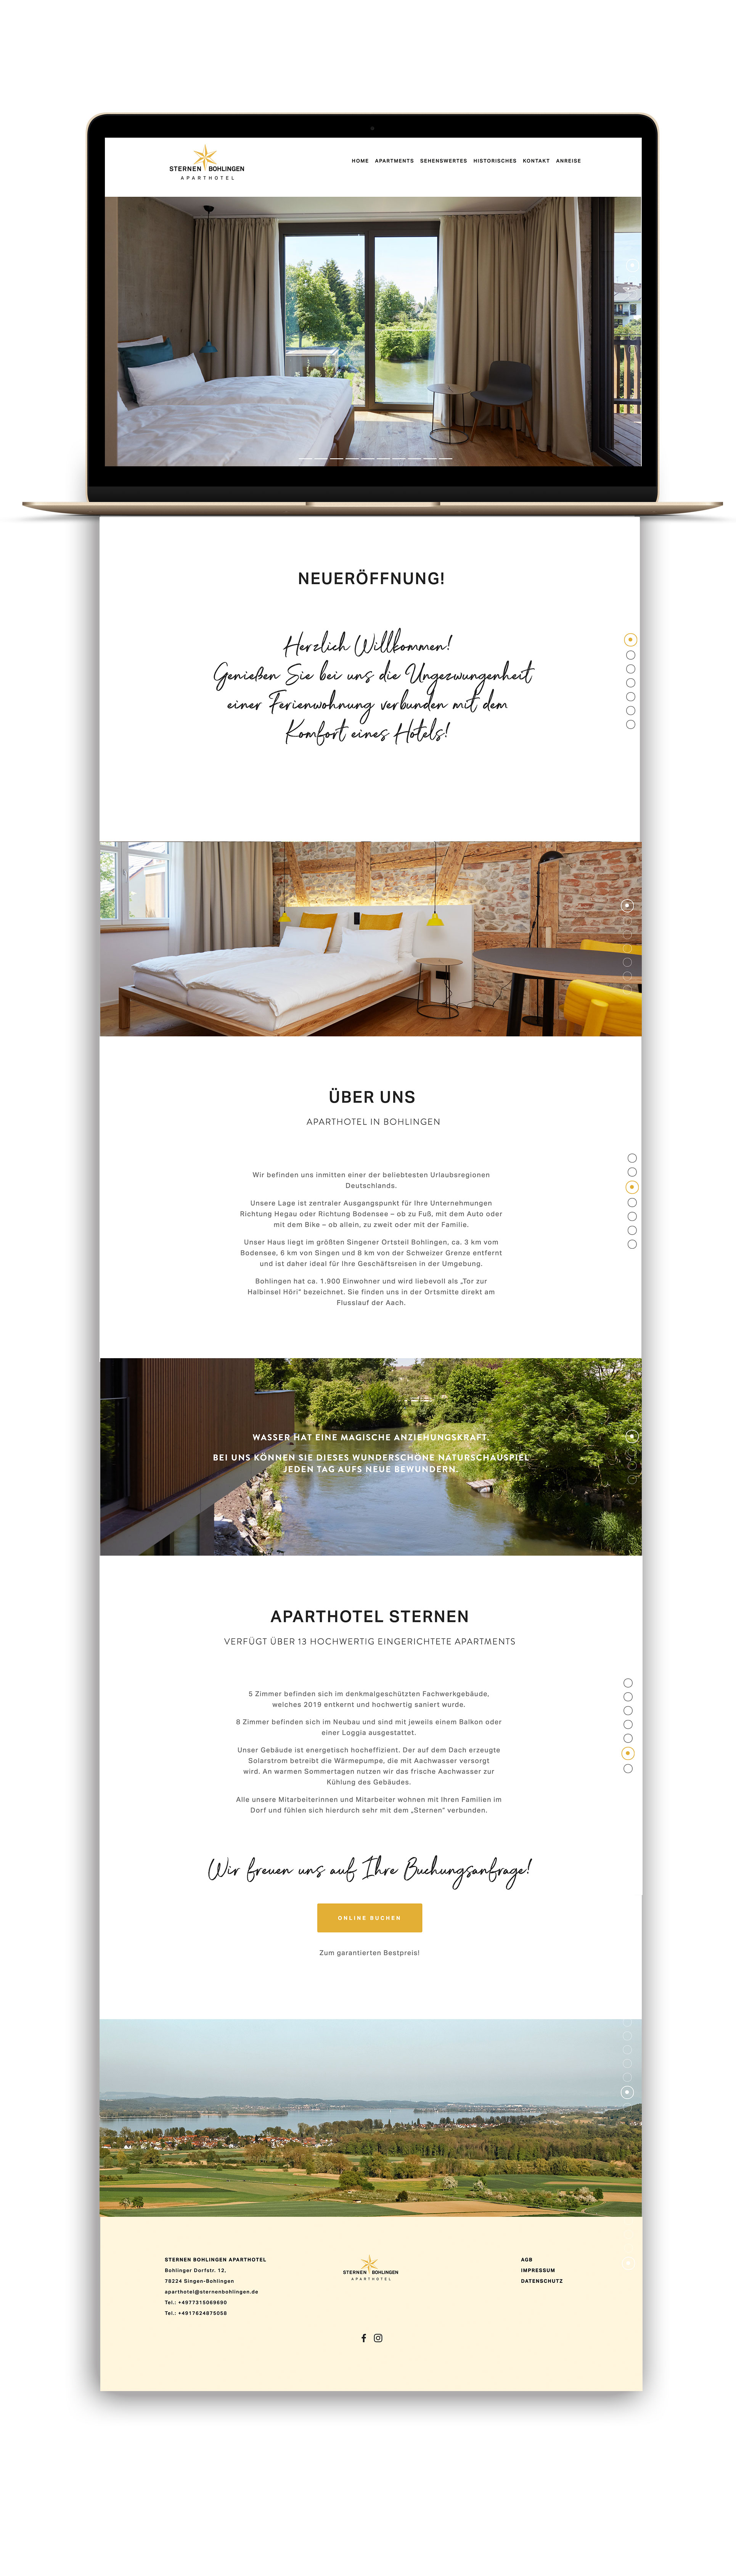 Sternen-bohlingen-hotel---mock-up.jpg